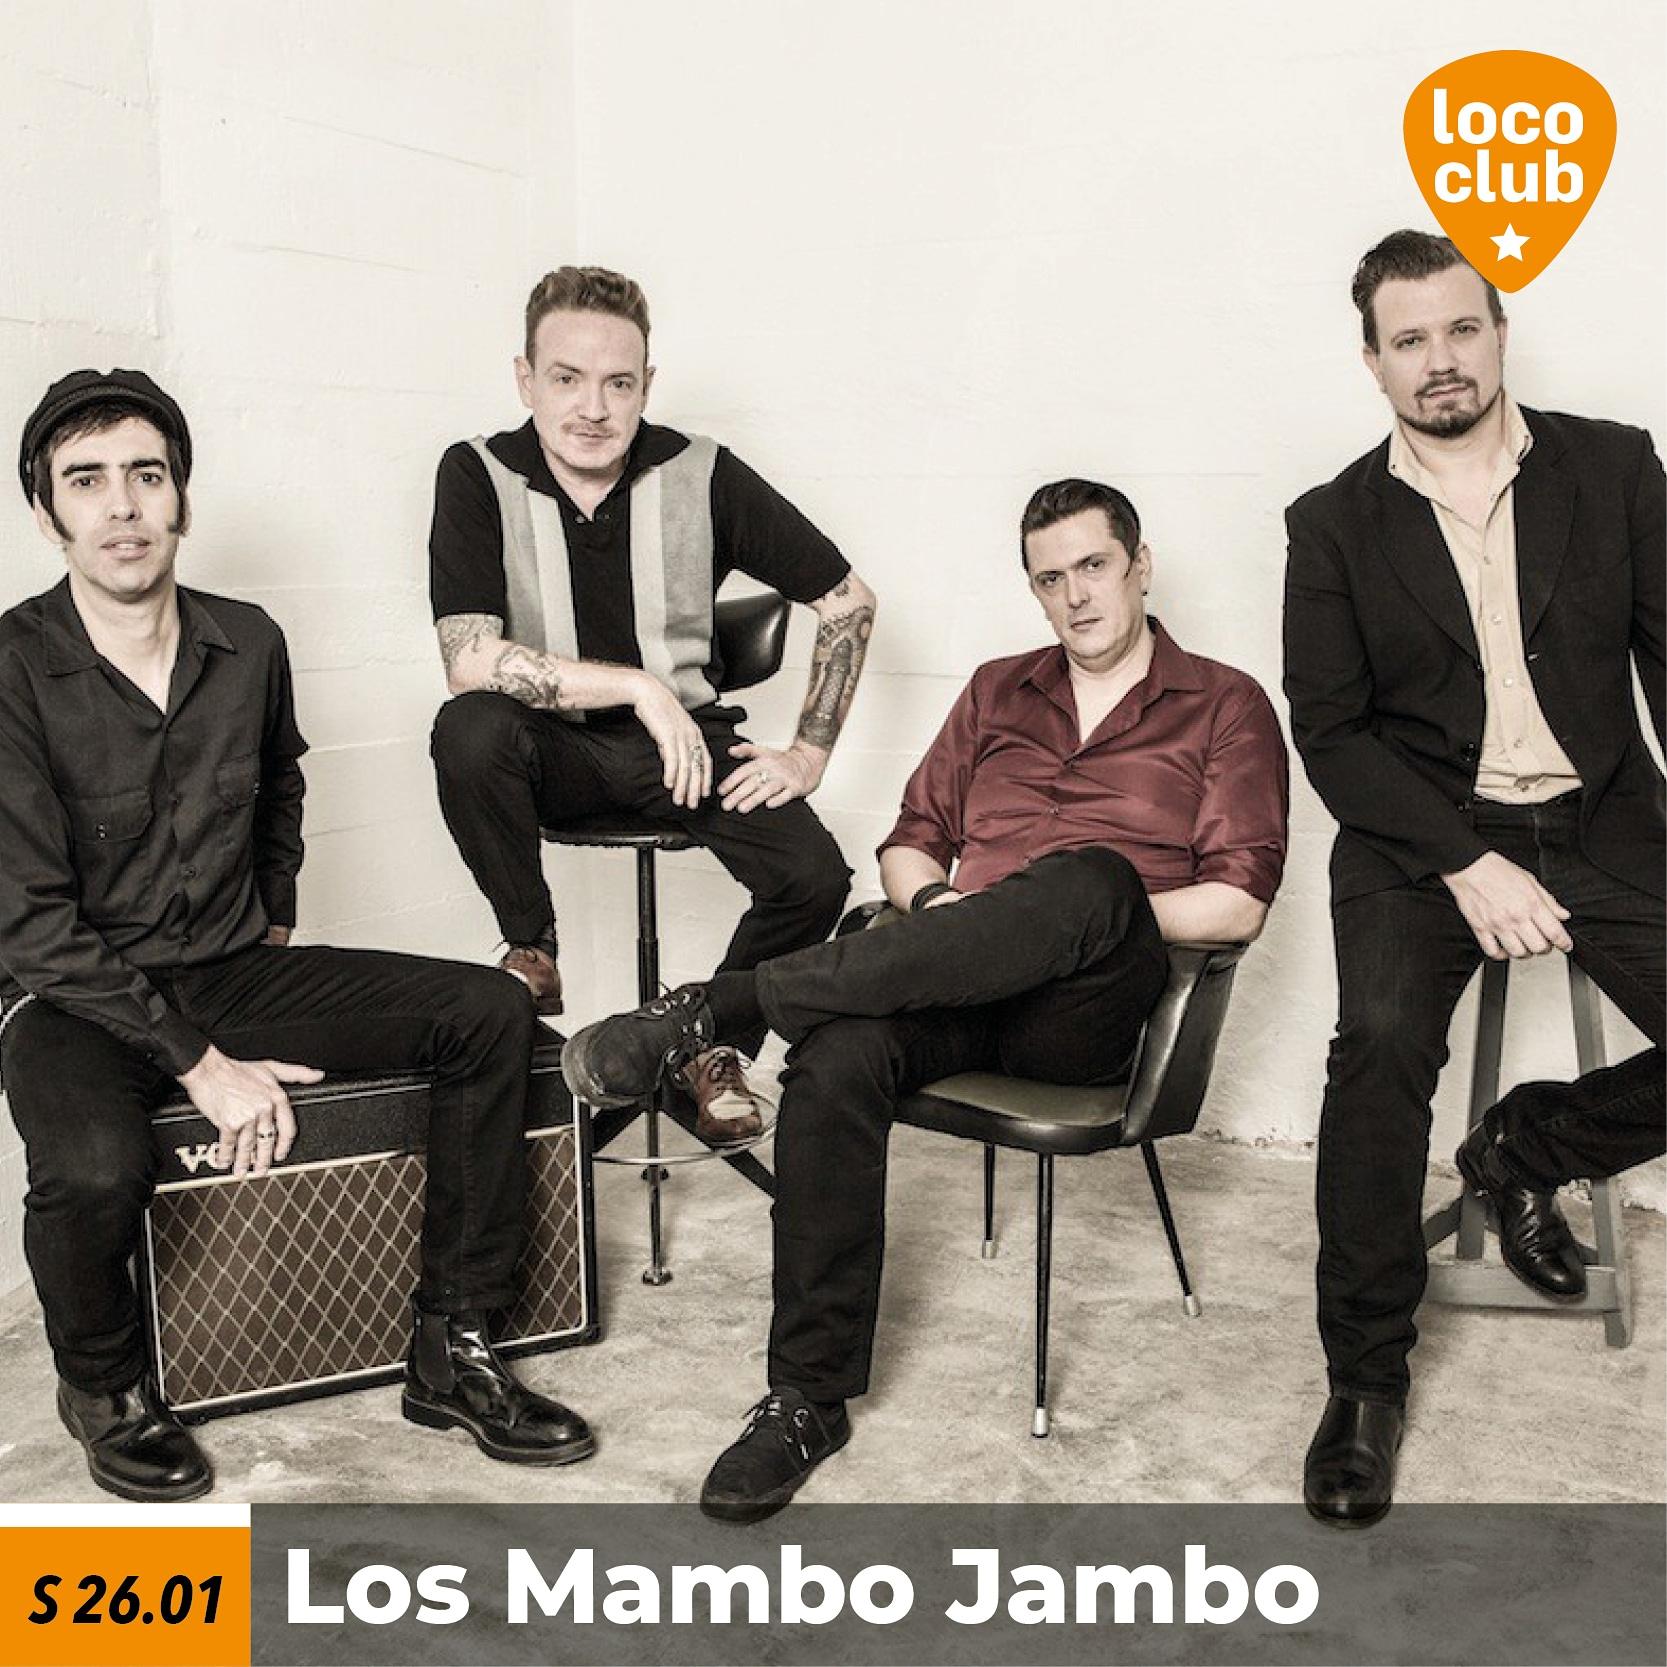 LOS MAMBO JAMBO 26 ENERO 2019 LOCO CLUB  Img_2273